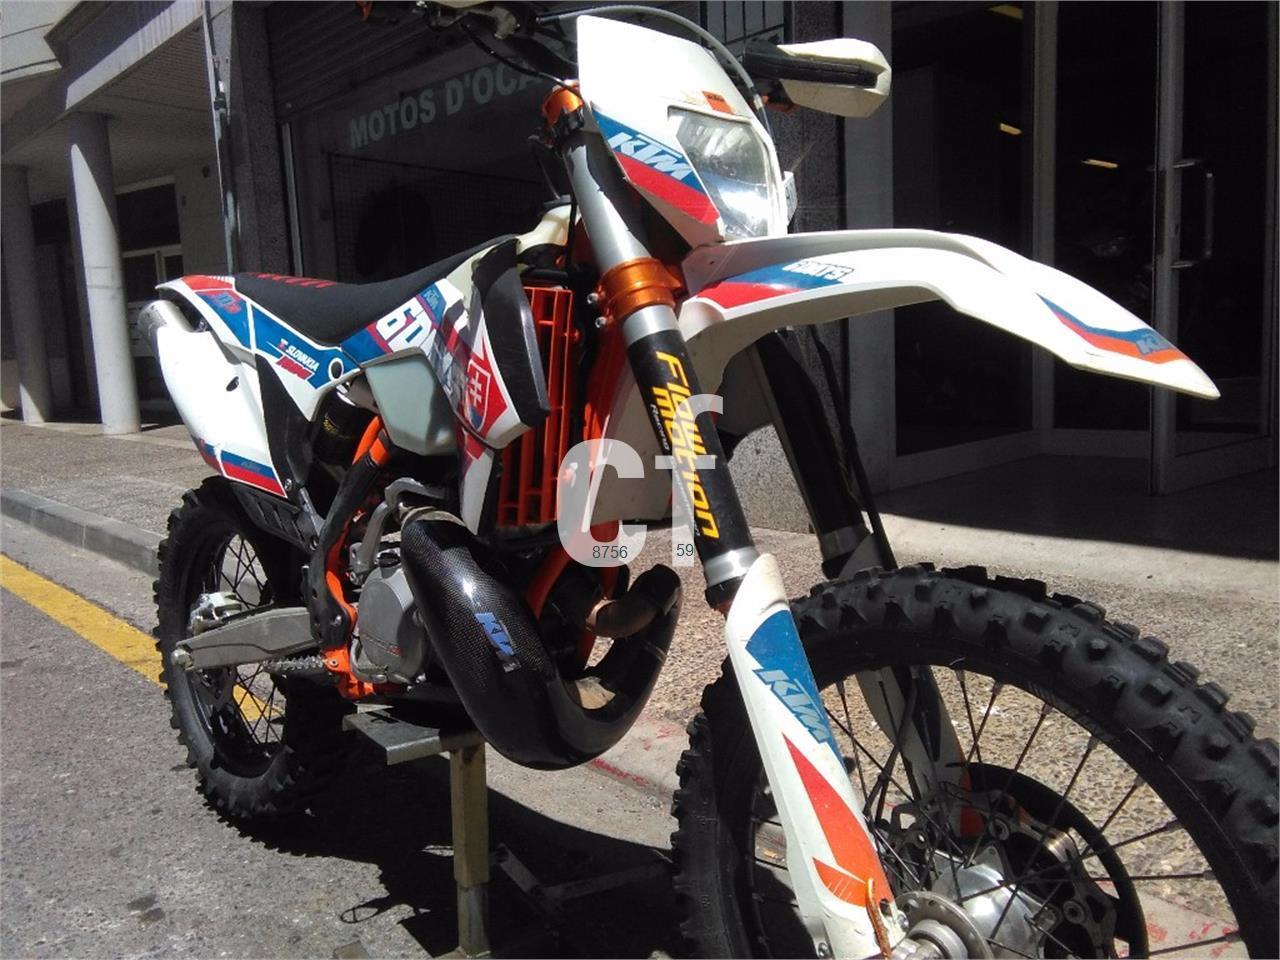 KTM EXC 300 SIX DAYS de venta